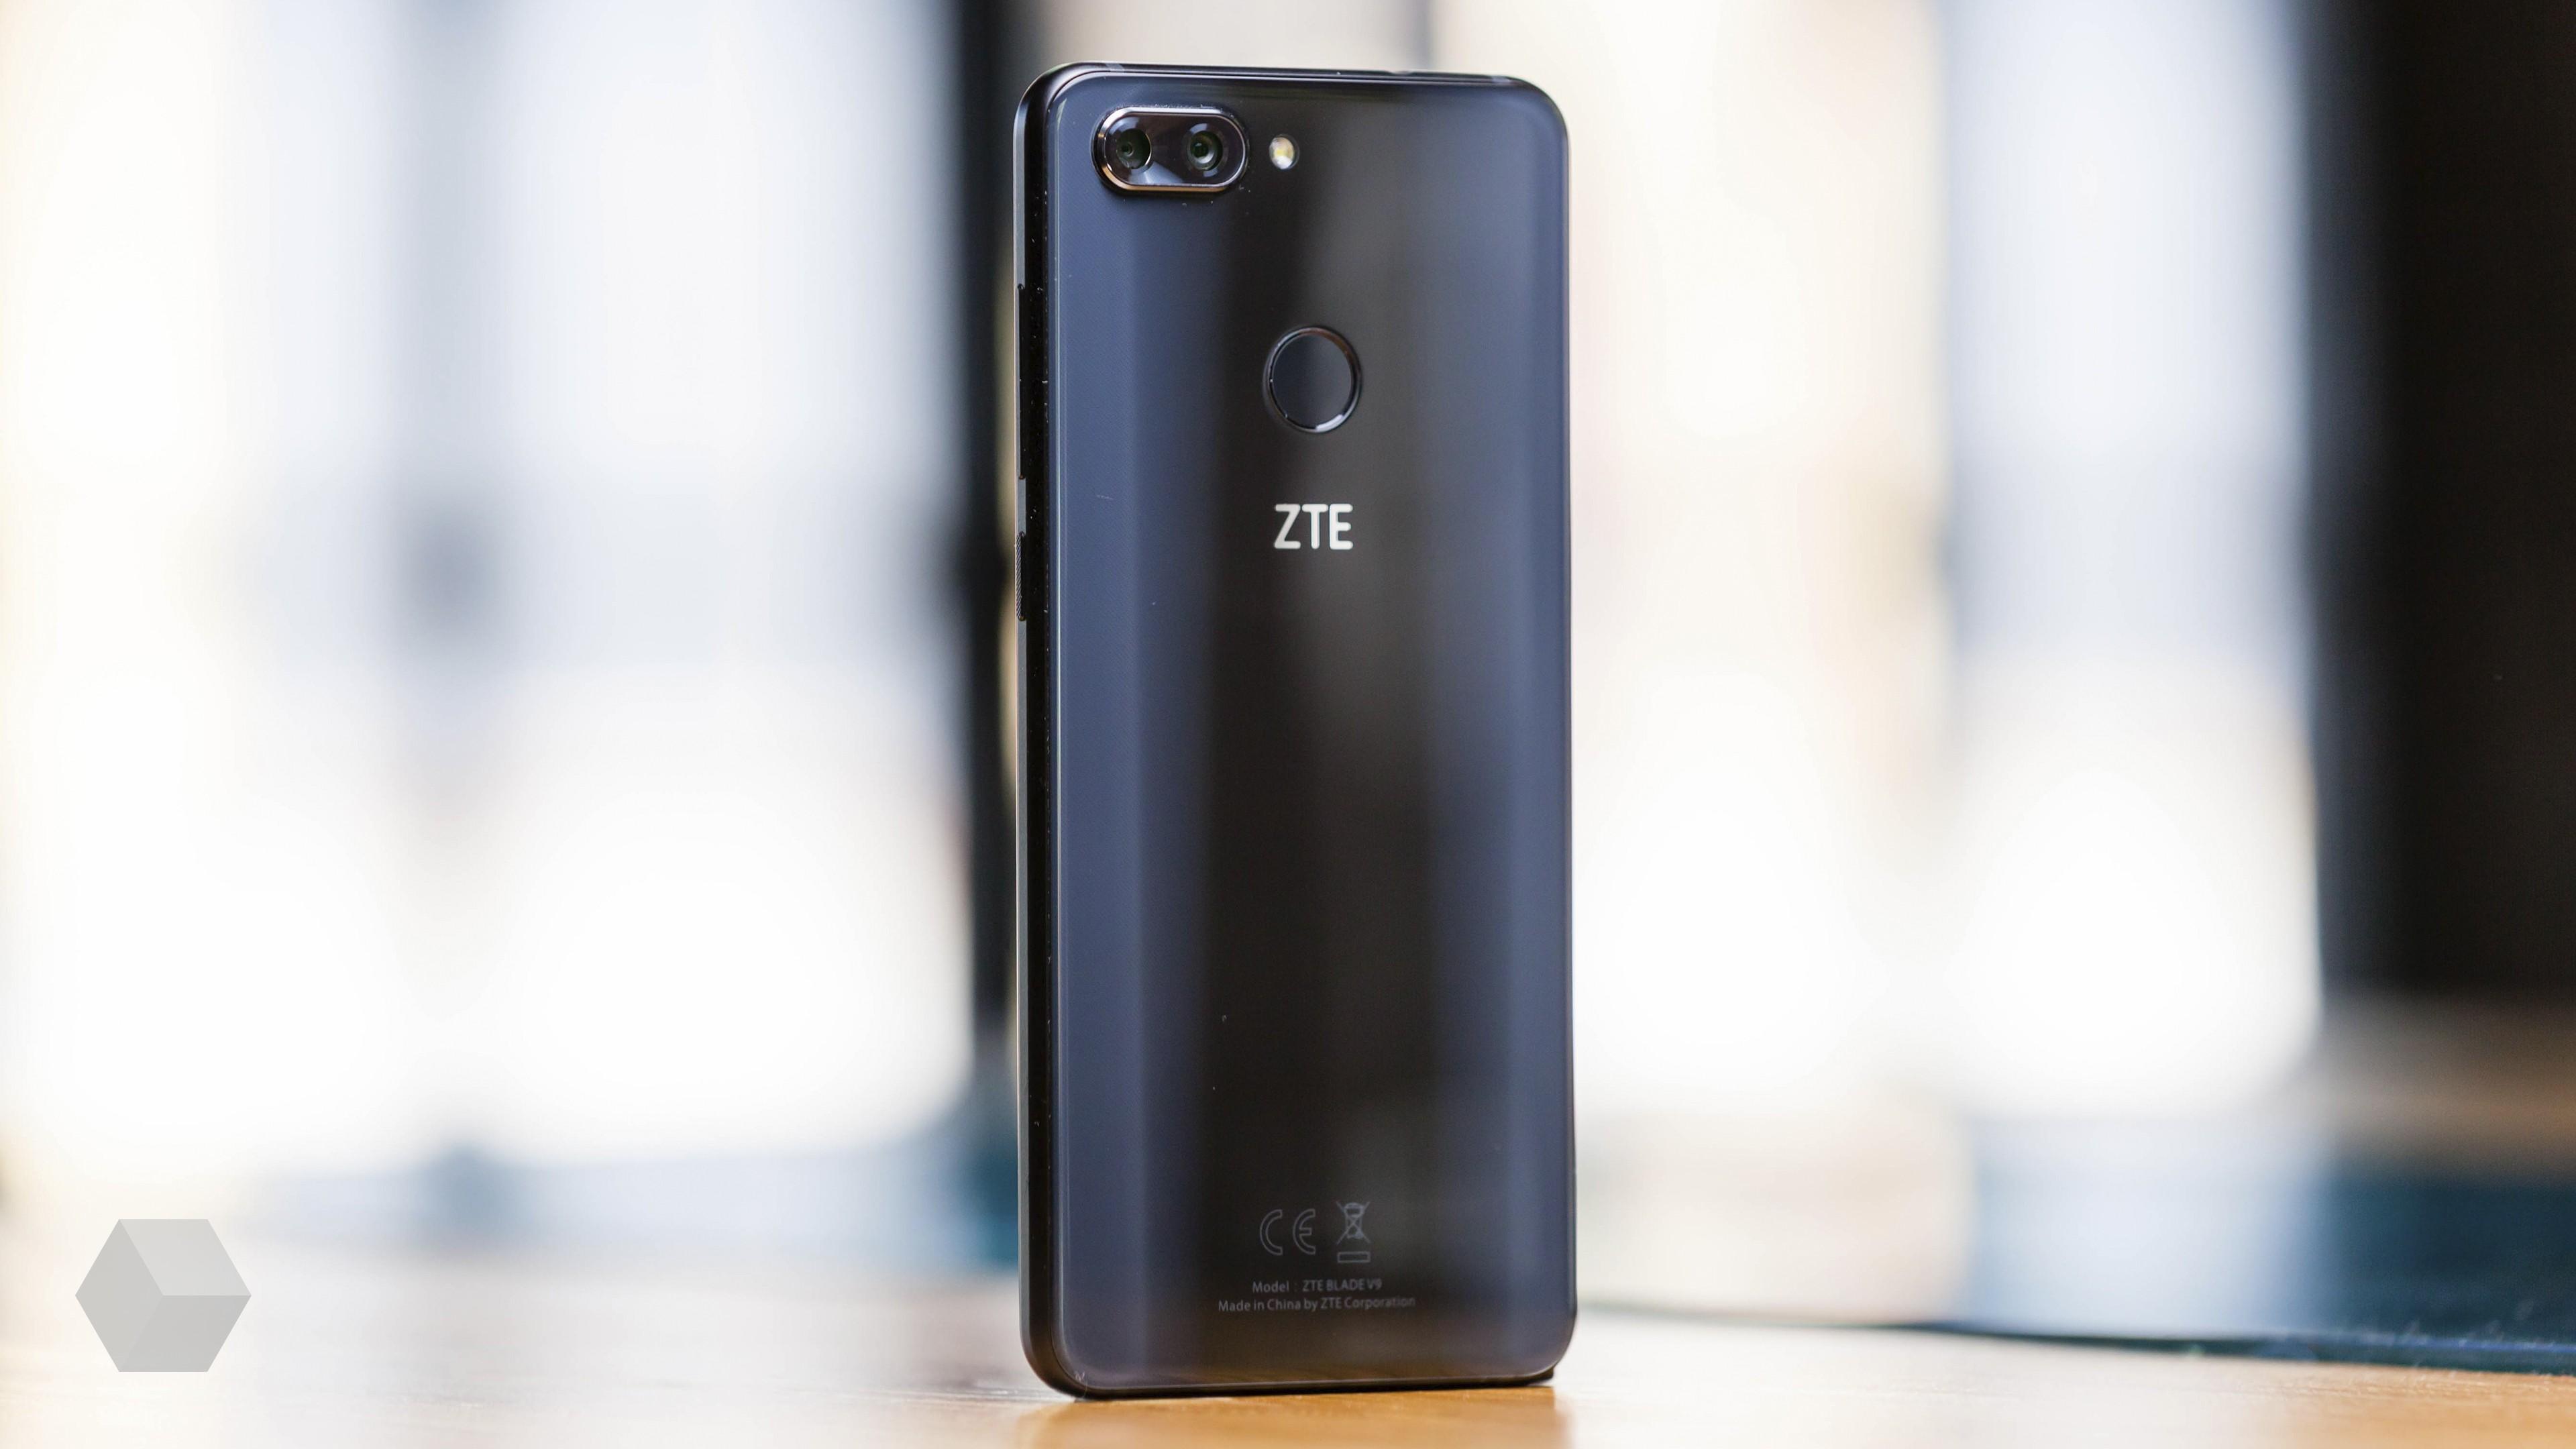 Обзор среднебюджетного ZTE V9 Blade